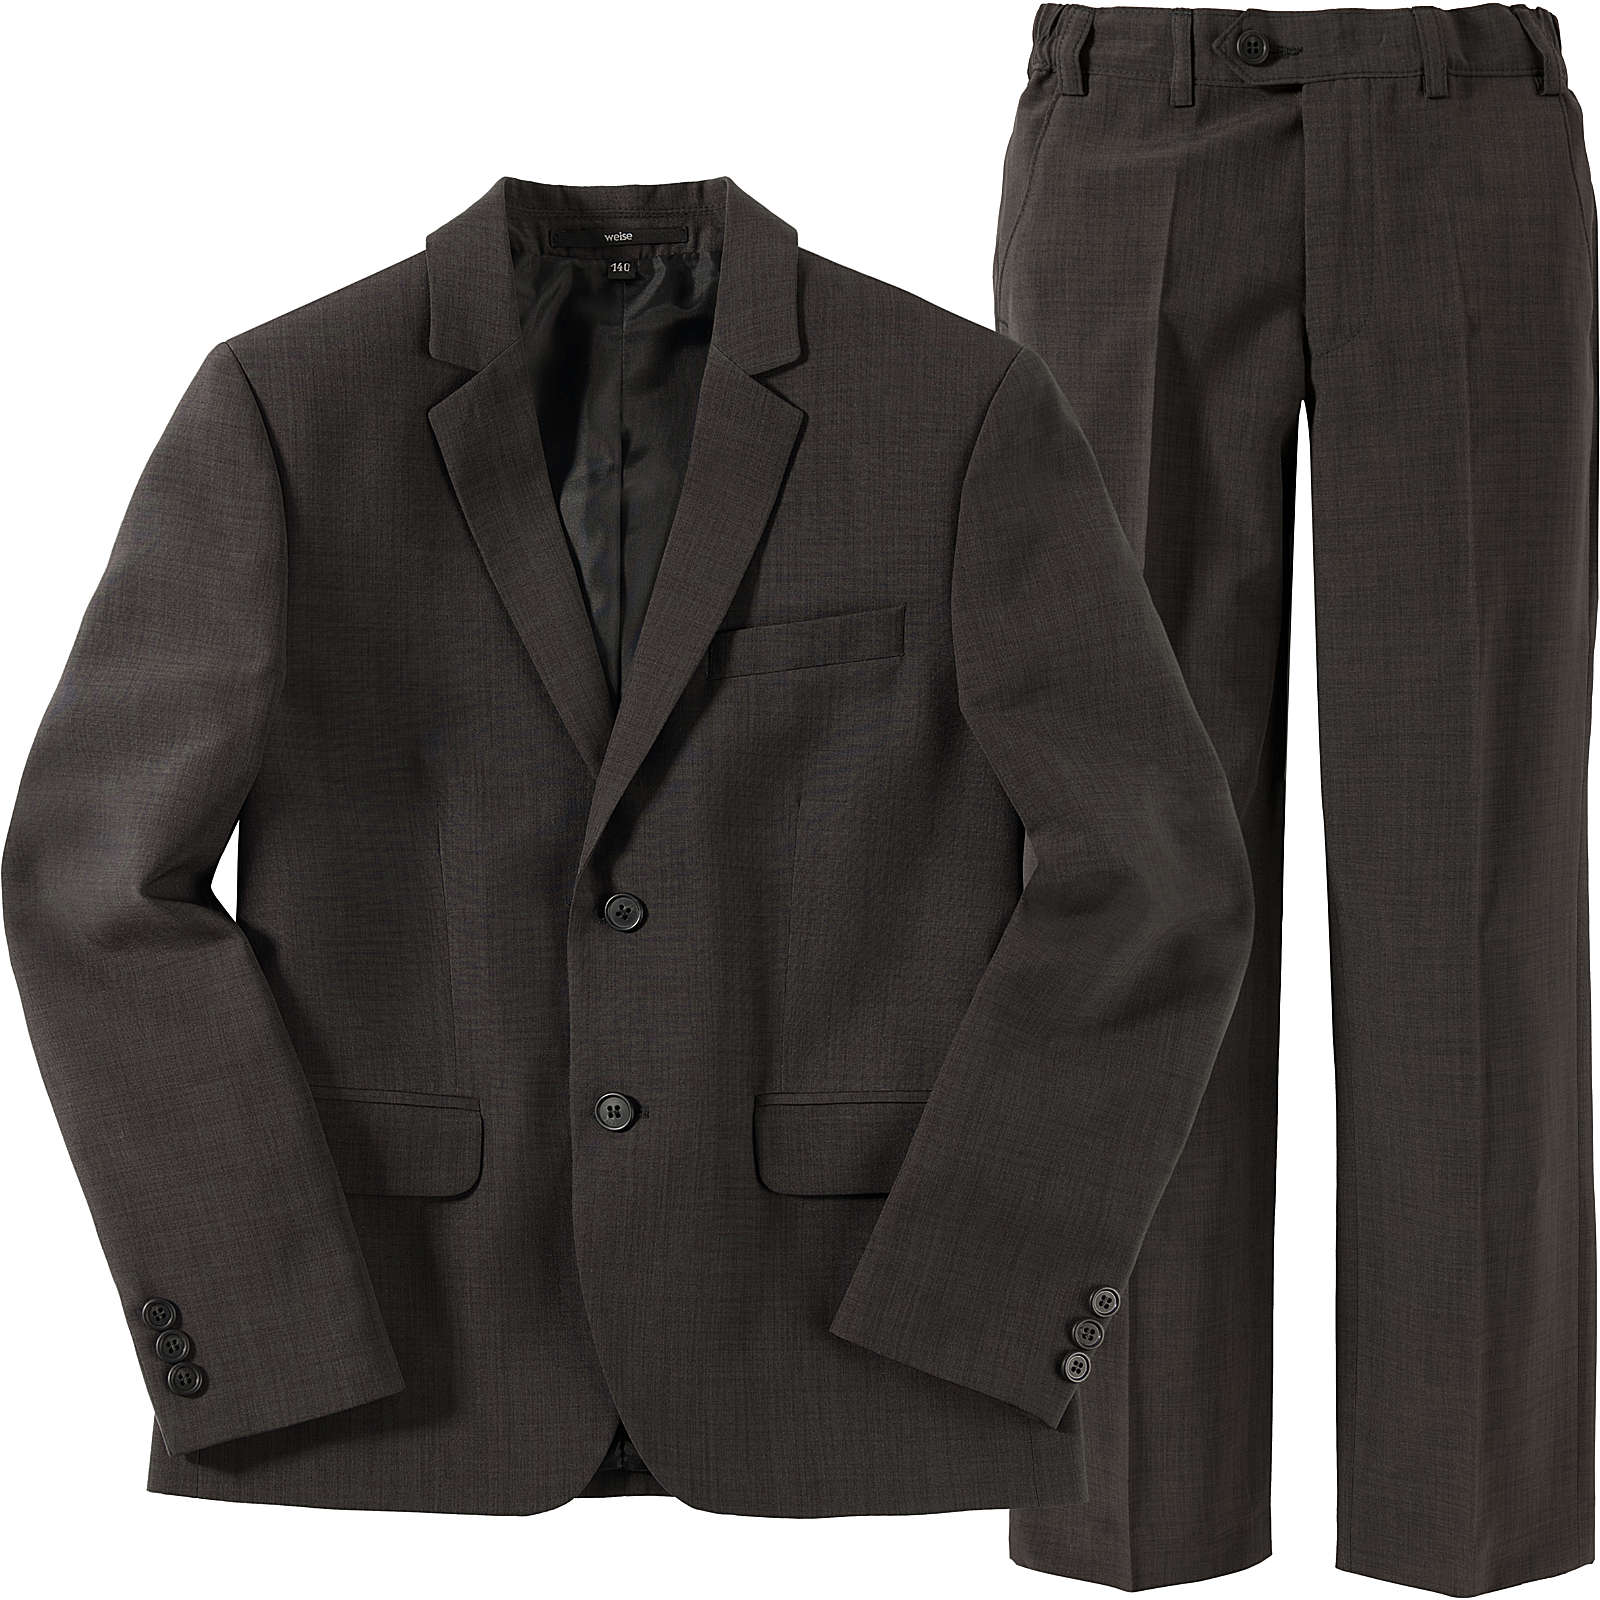 WEISE Kinder Anzug REGULAR anthrazit Junge Gr. 128